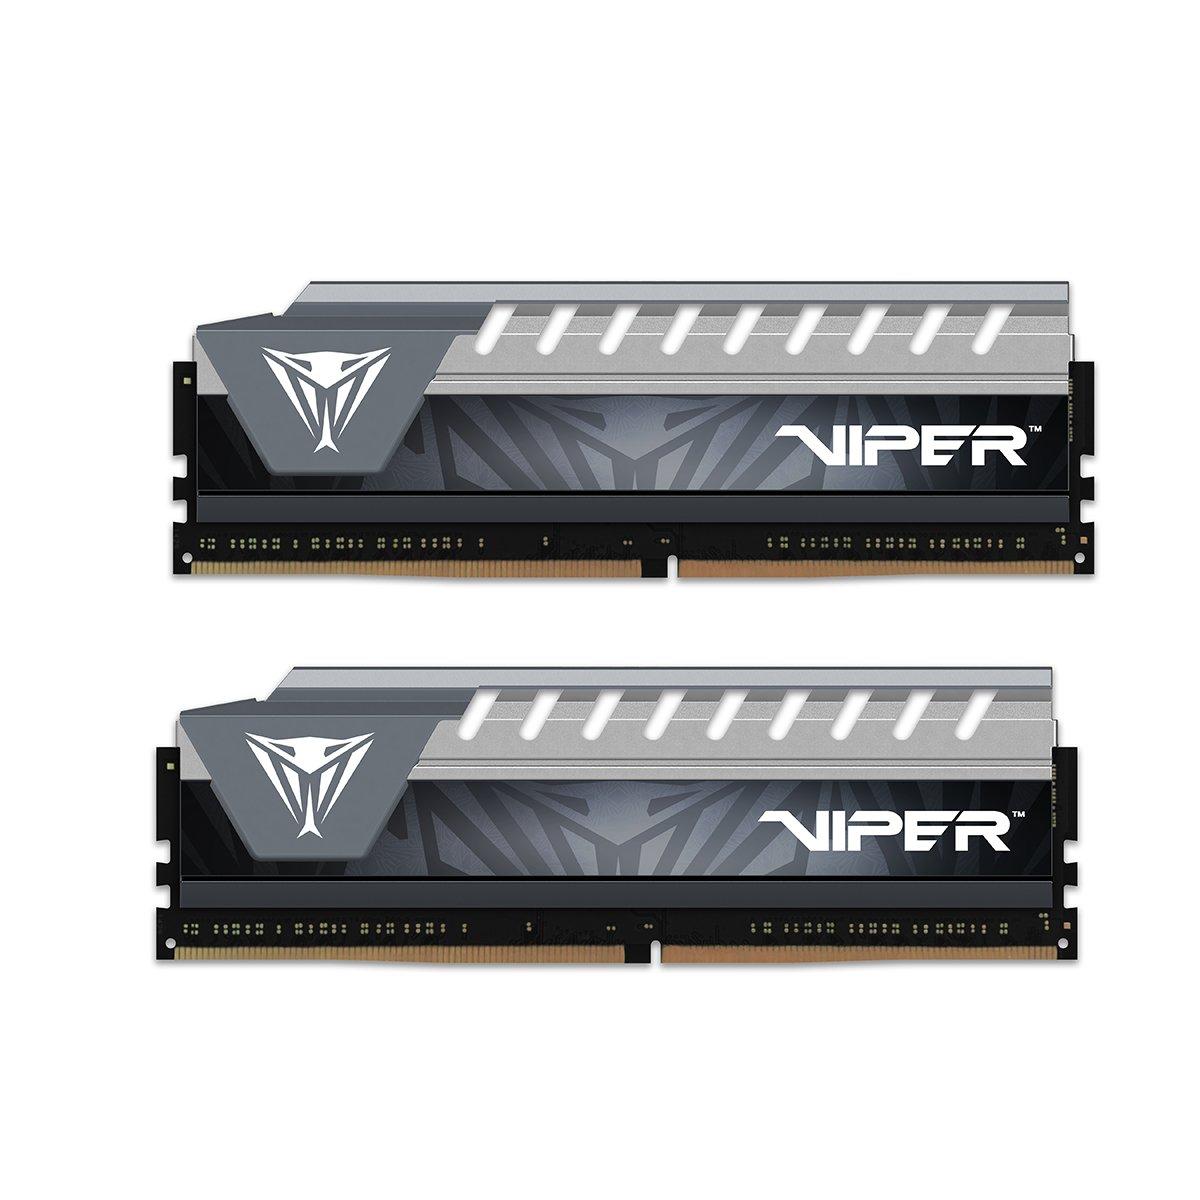 Patriot Viper Elite Series DDR4 8GB (2x4GB) 2666MHz PC4-21300 Dual Channel Kit (Black/Grey) PVE48G266C6KGY